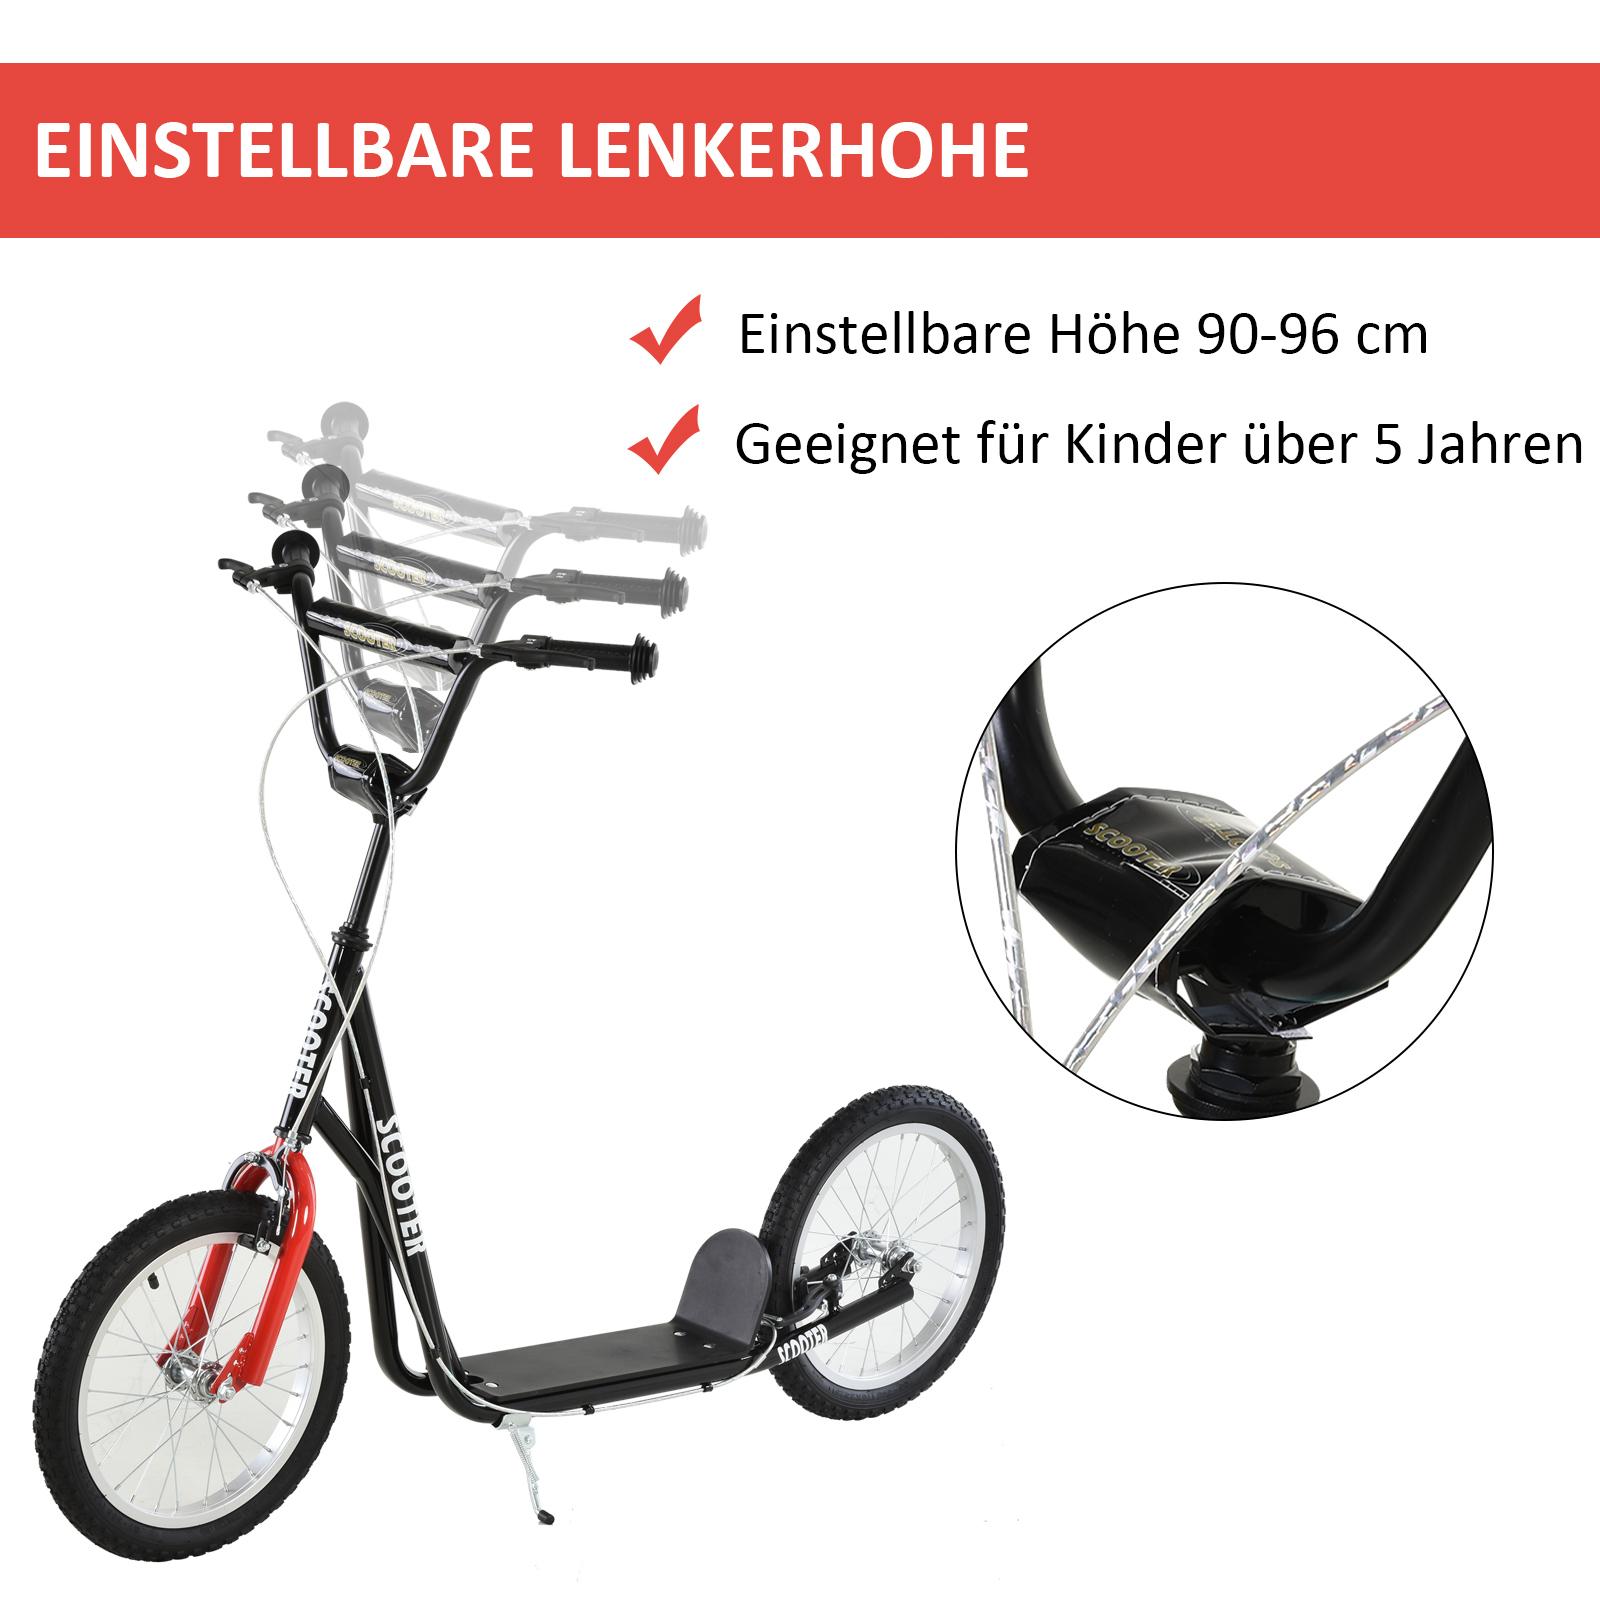 Indexbild 33 - HOMCOM-Tretroller-Kinderroller-Scooter-Cityroller-Roller-verstellbar-Blau-Gruen